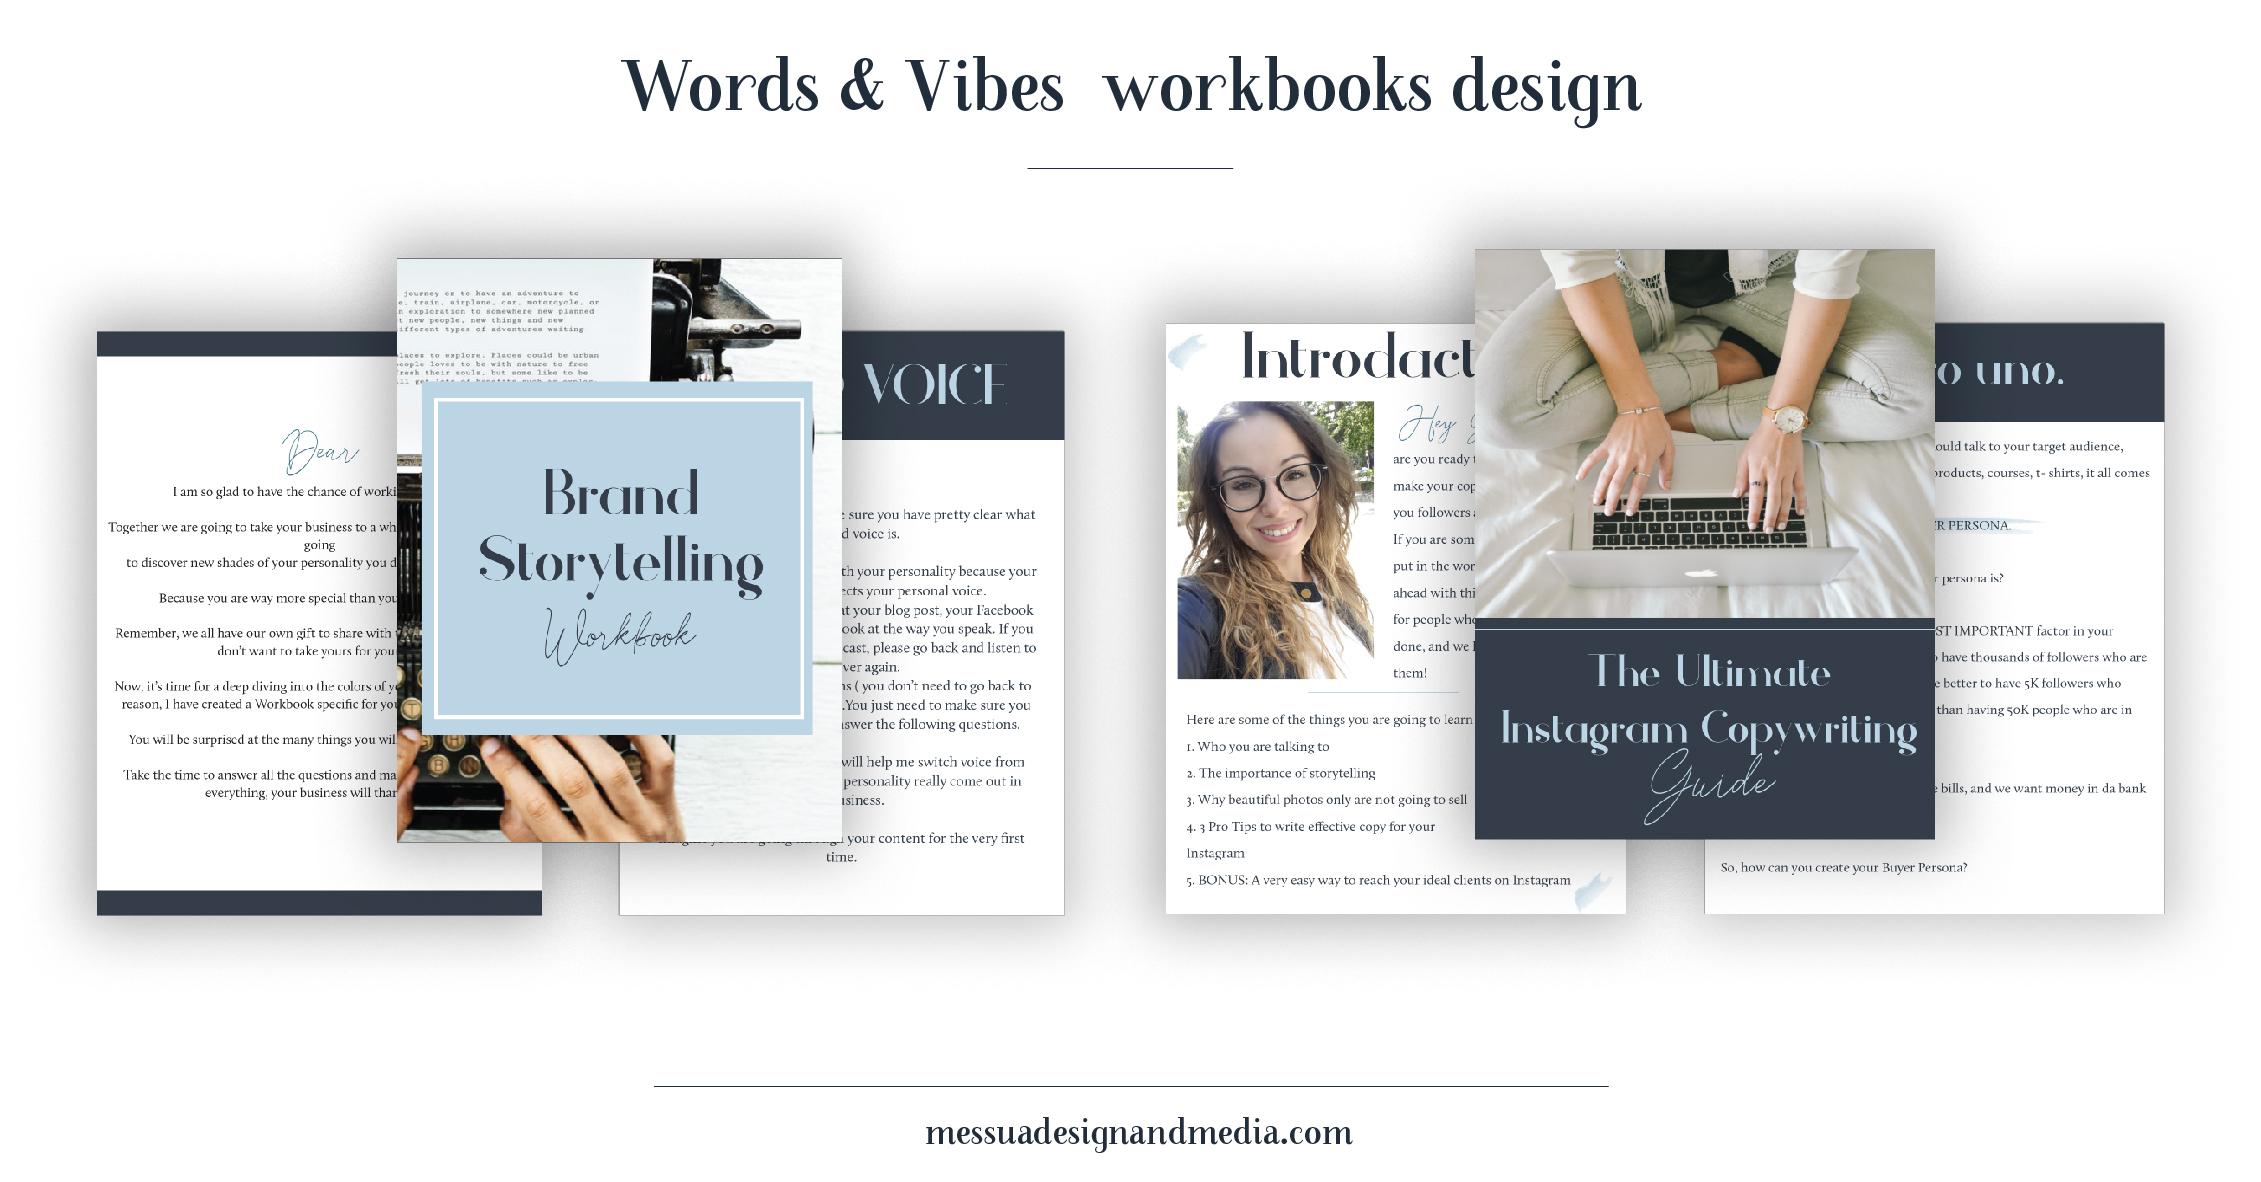 word & vibes workbooks showcase-100.jpg